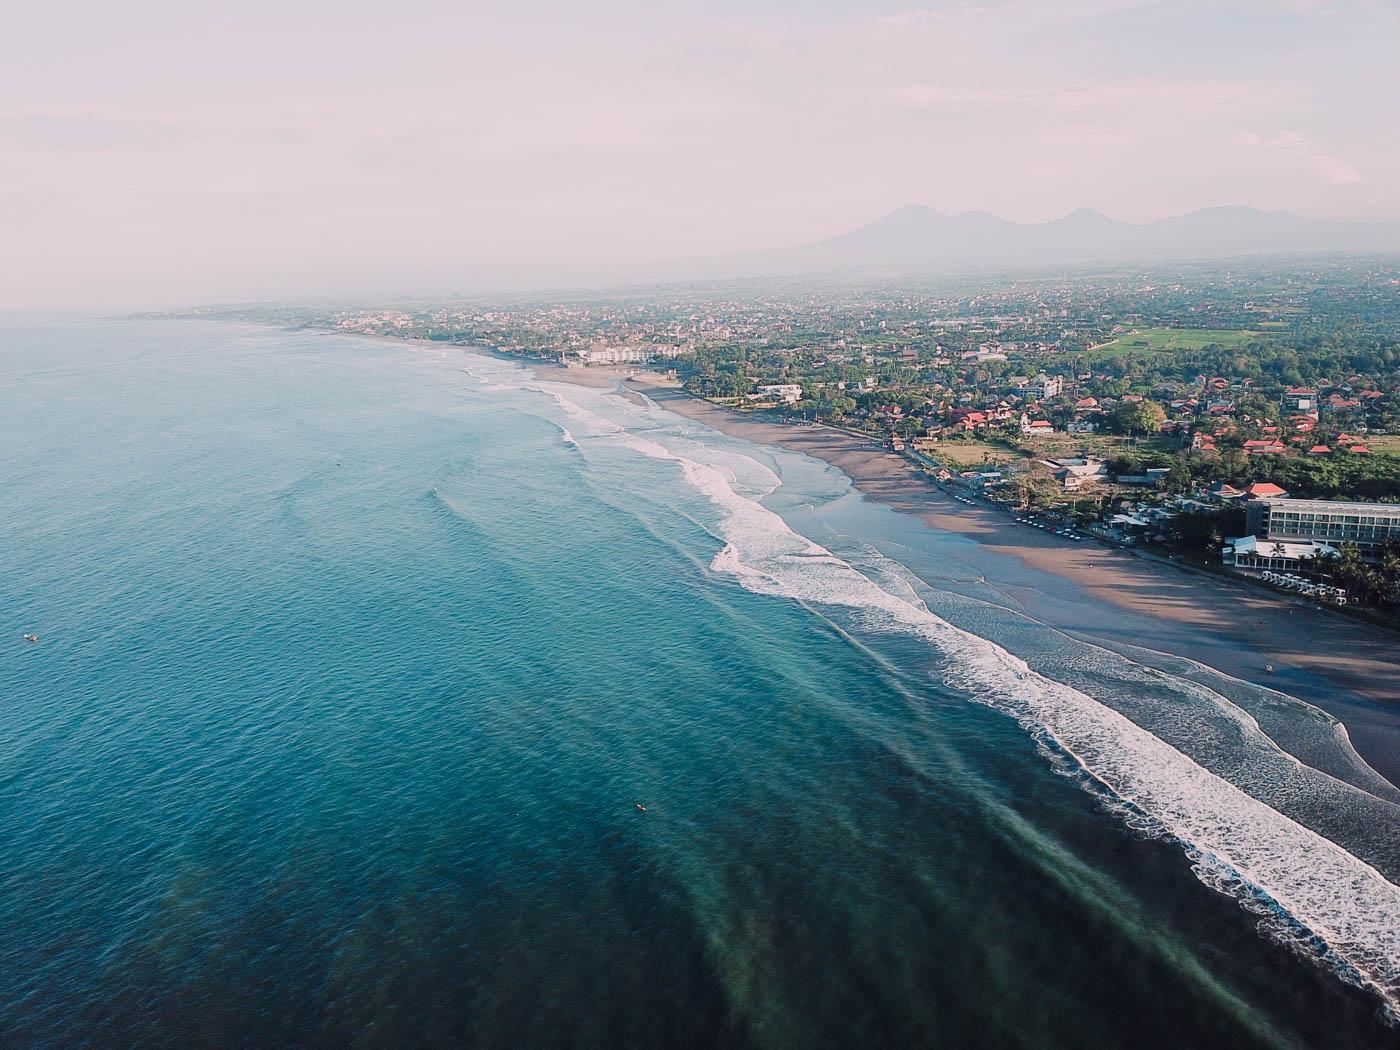 Bali-traveldestinations-bali-beautifulplaces-5.jpg